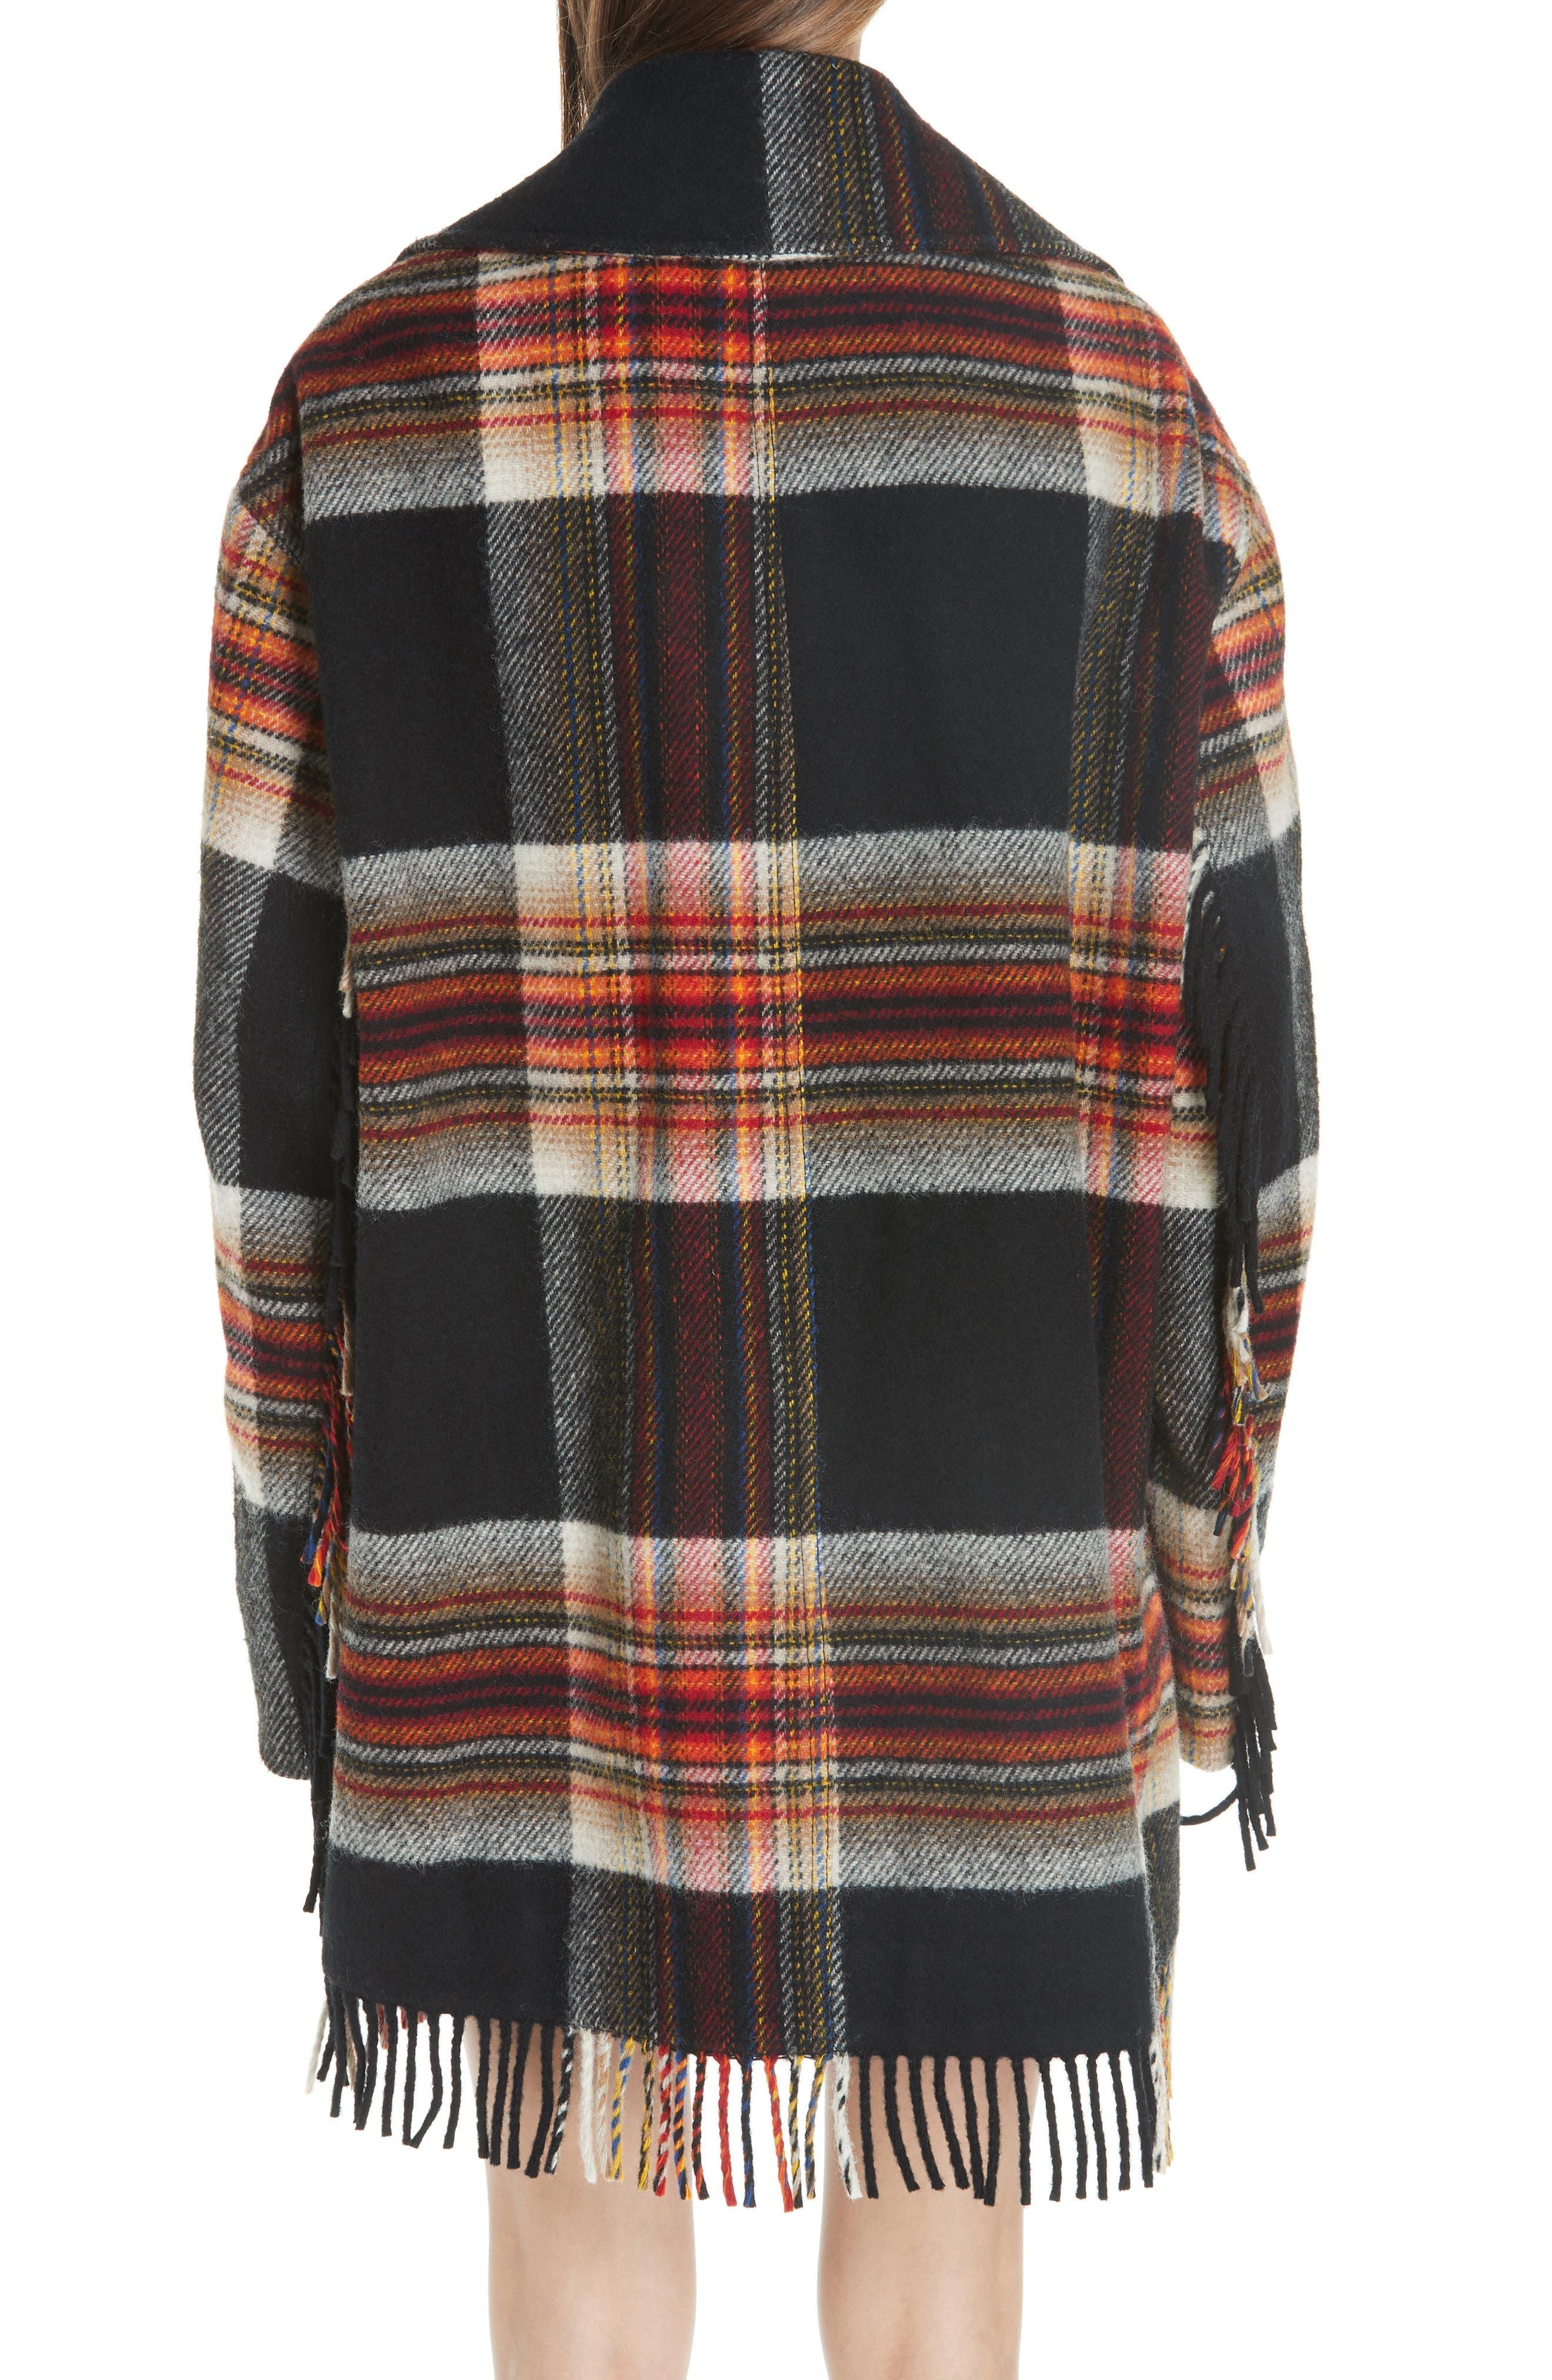 x Pendleton Fringe Plaid Blanket Coat,                             Alternate thumbnail 2, color,                             001